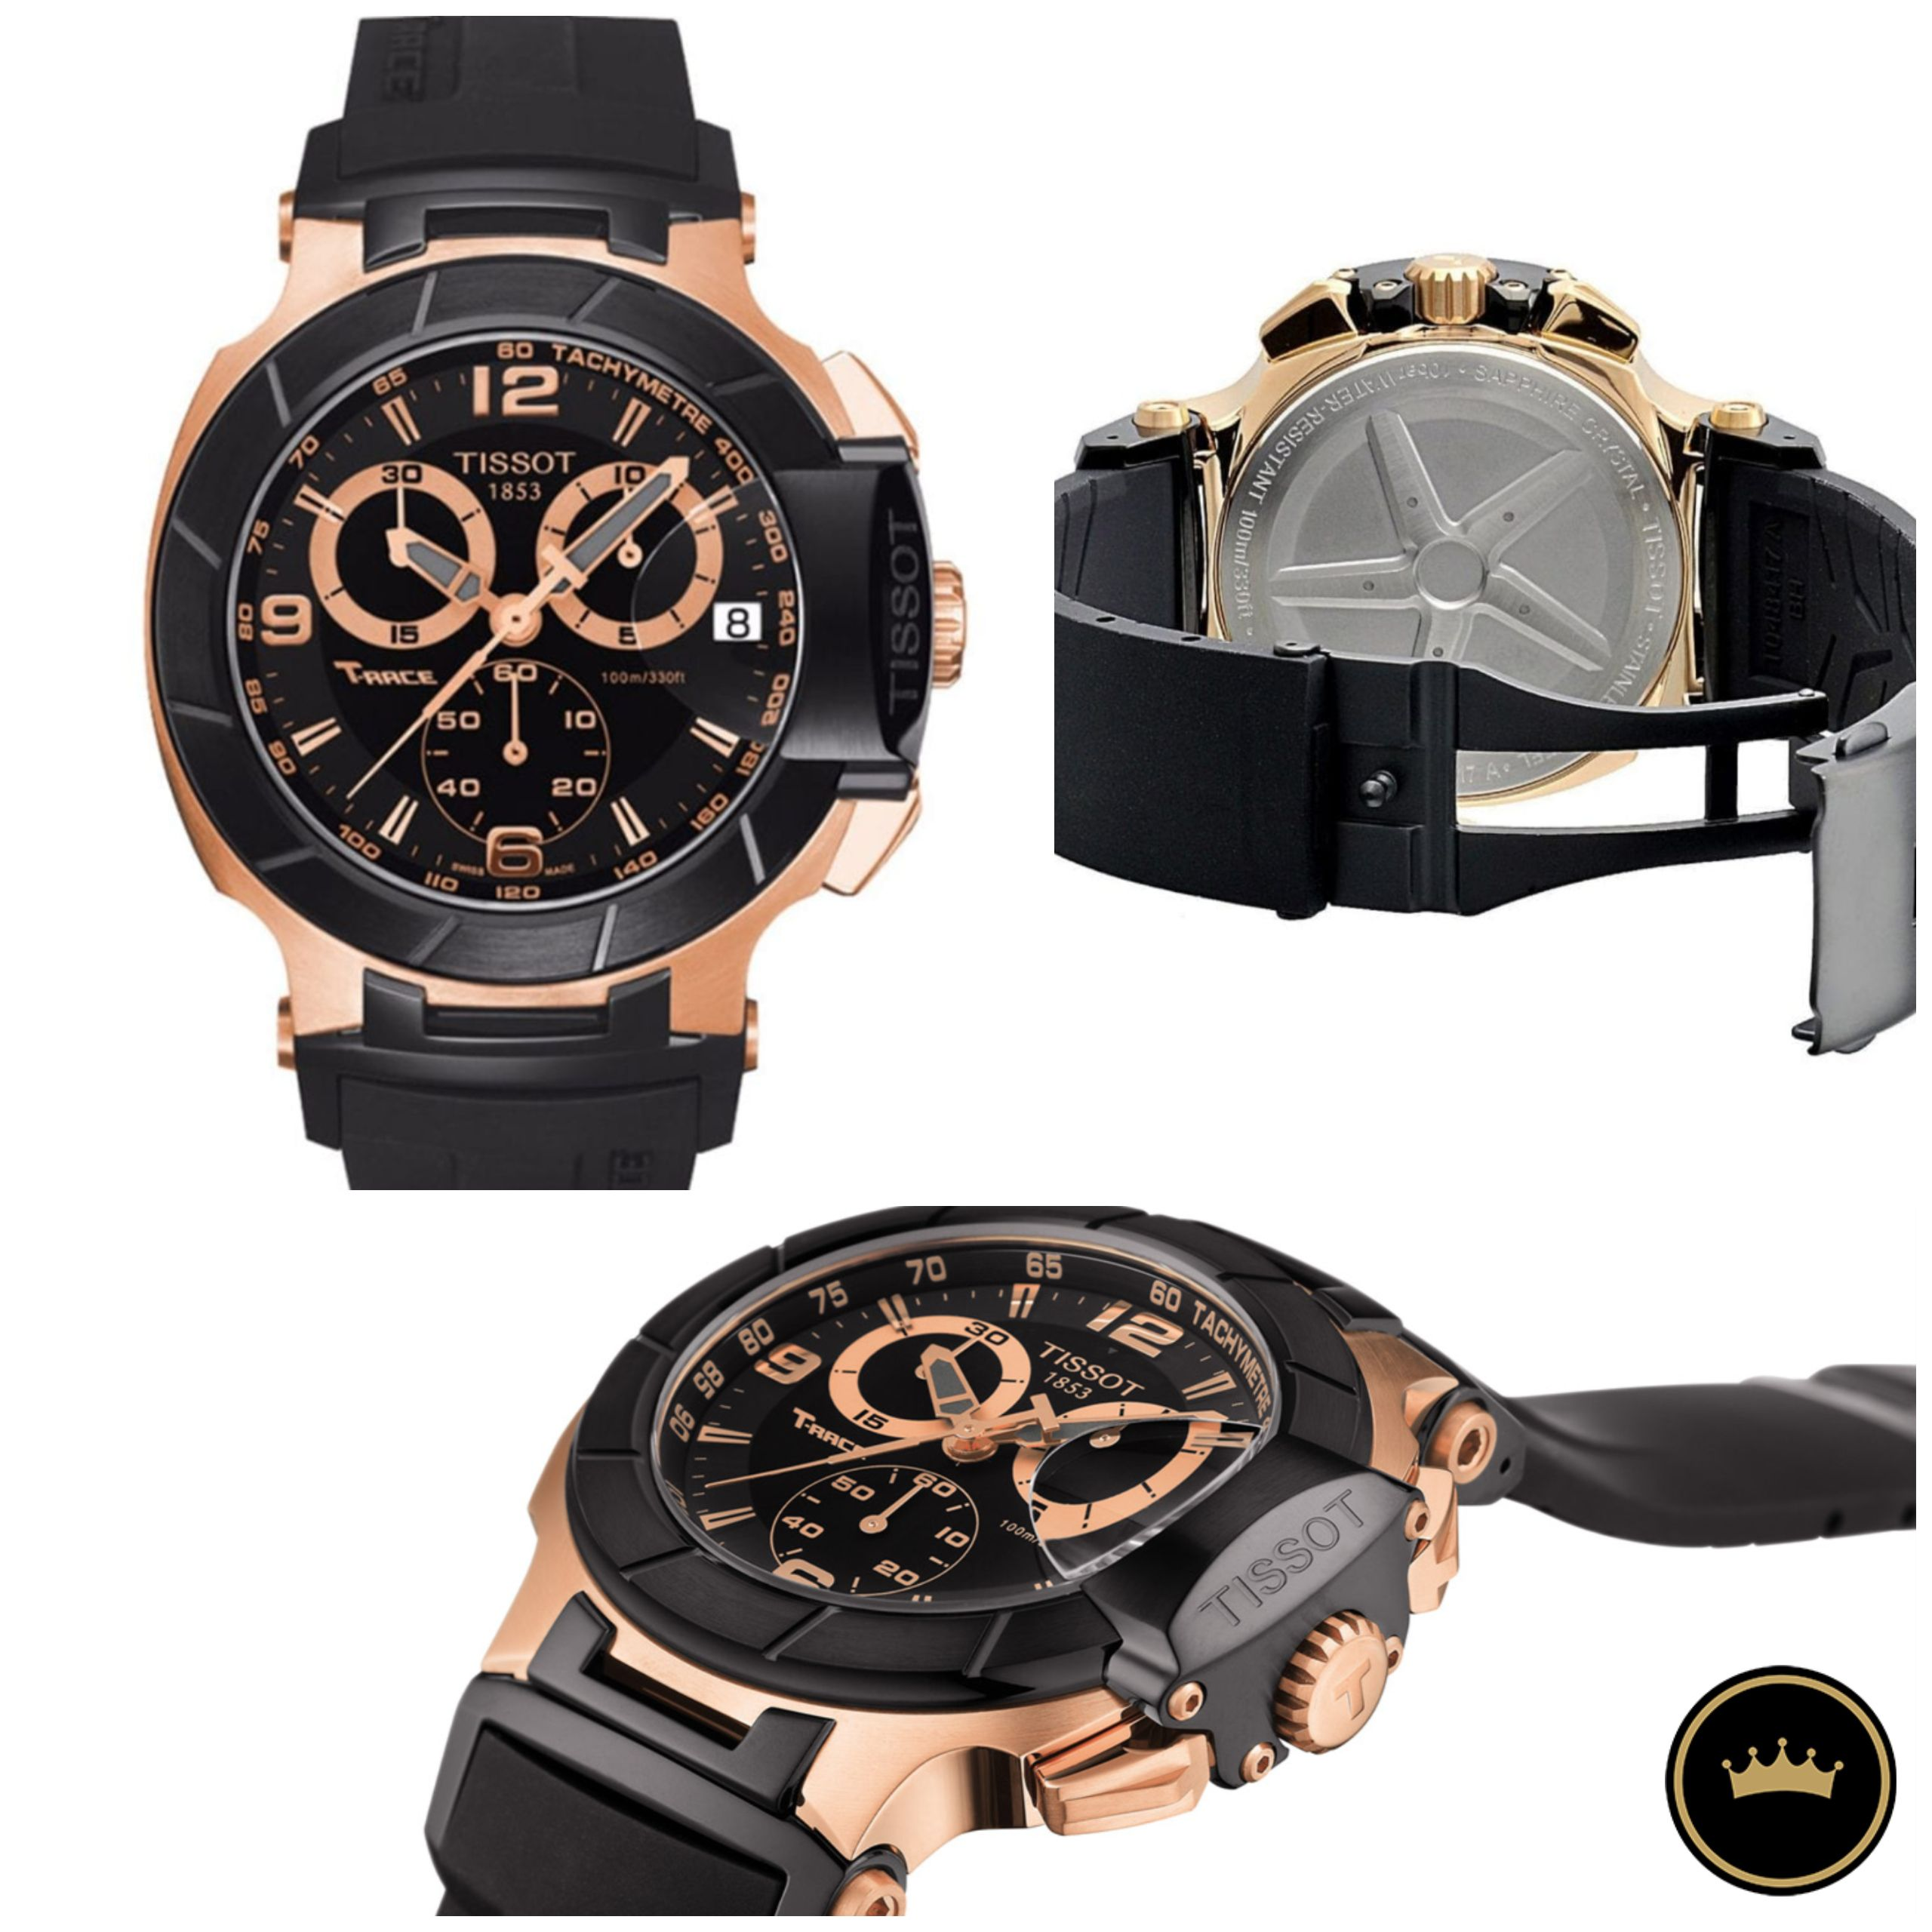 Kanarygifts من سويسرا ساعة تيسو الرياضية تي ريس للشباب بسعر حصري فقط 1279 Feel The Need For Sophisticated Tissot Mens Watch Chronograph Watches For Men